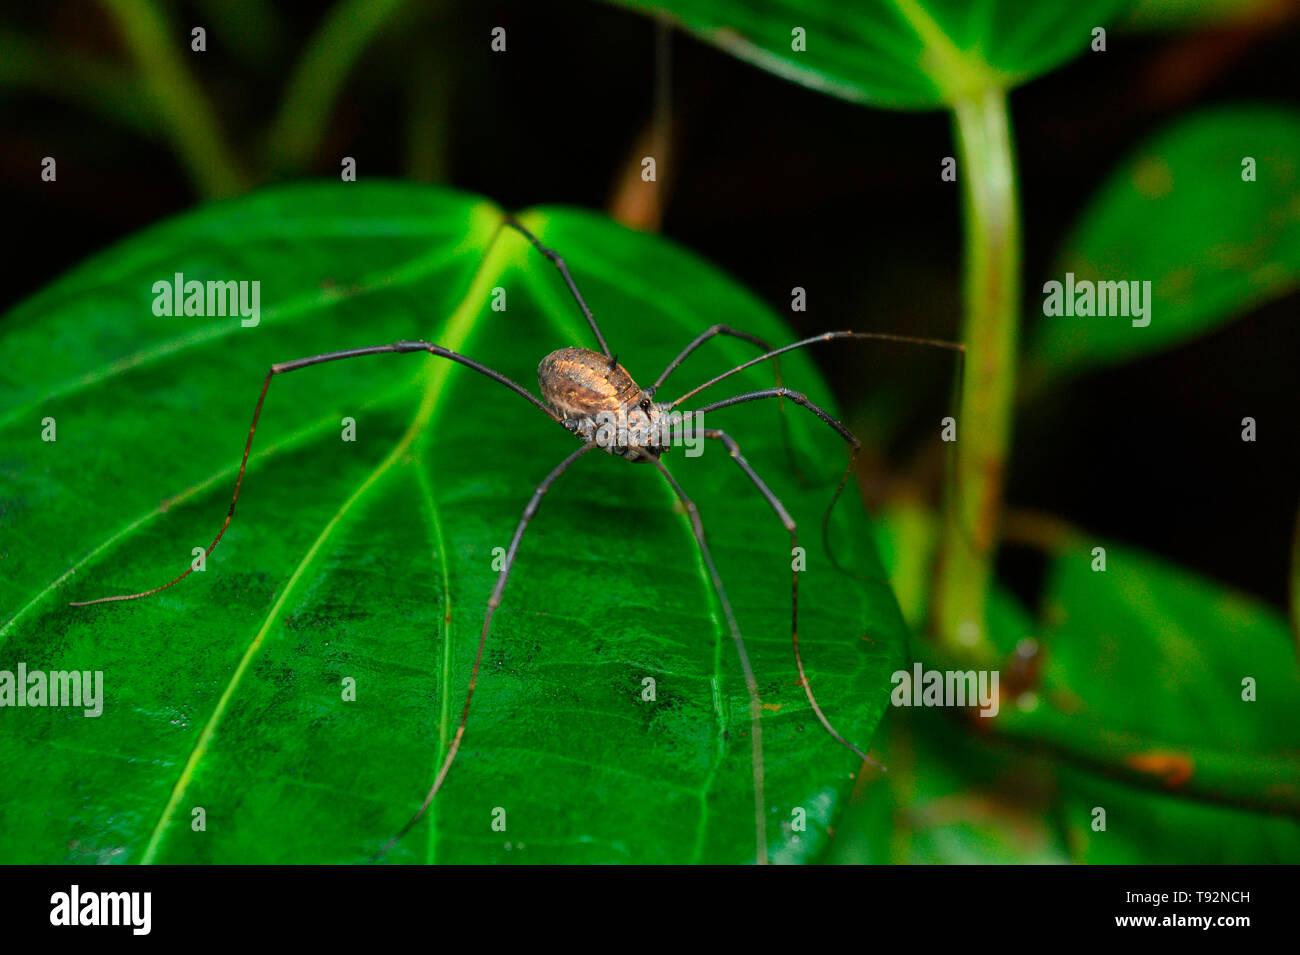 Harvestman spider, Ophilion, Satara, Maharashtra, India. - Stock Image